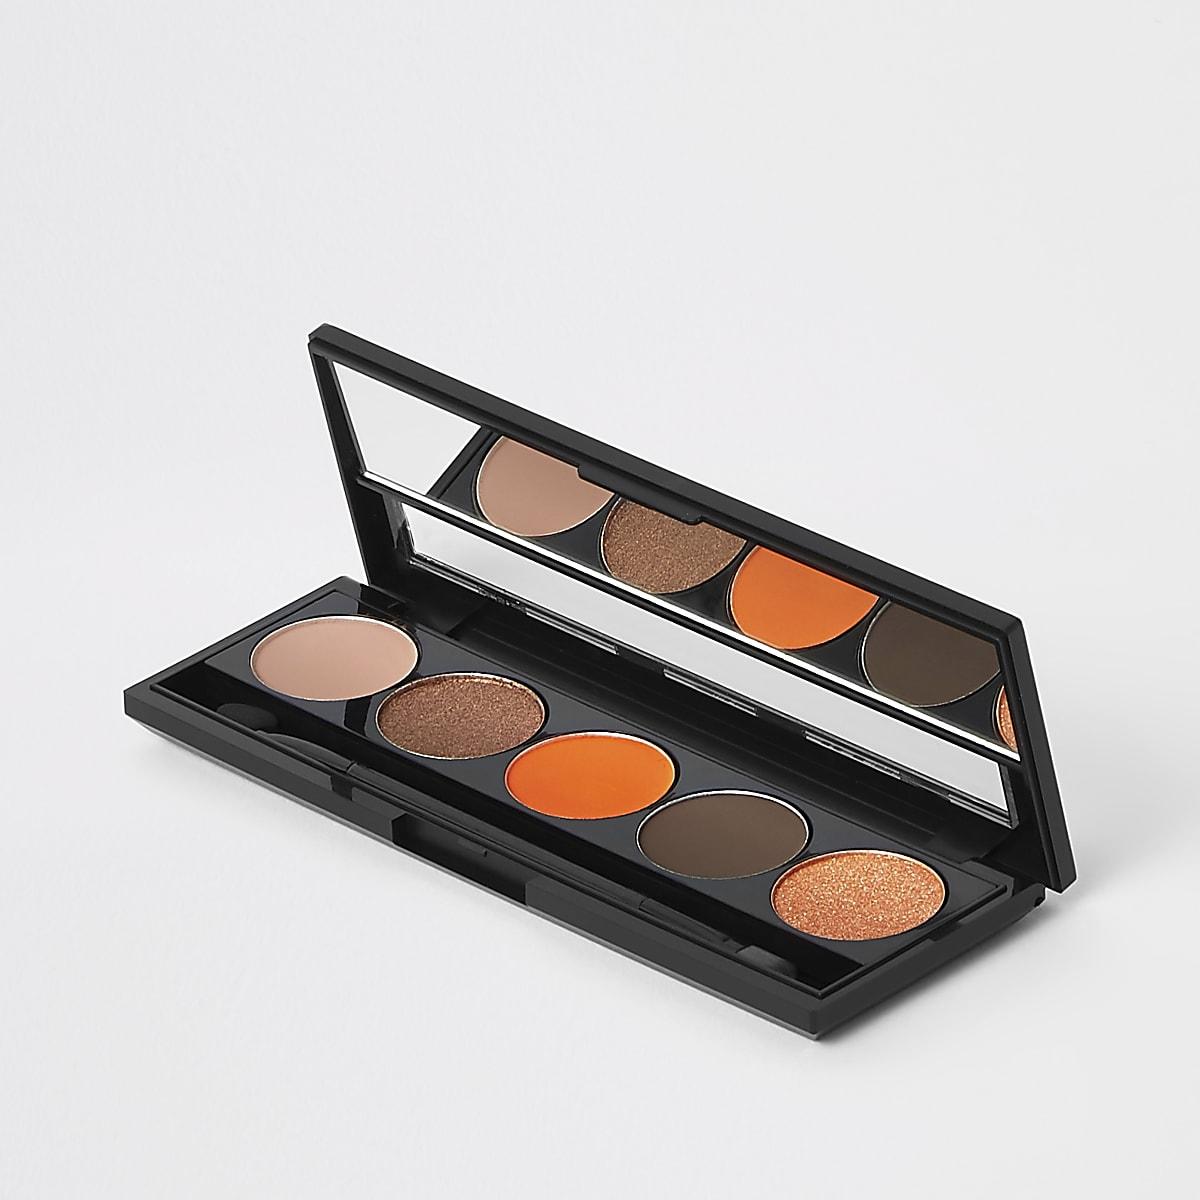 Oh my orange eyeshadow palette